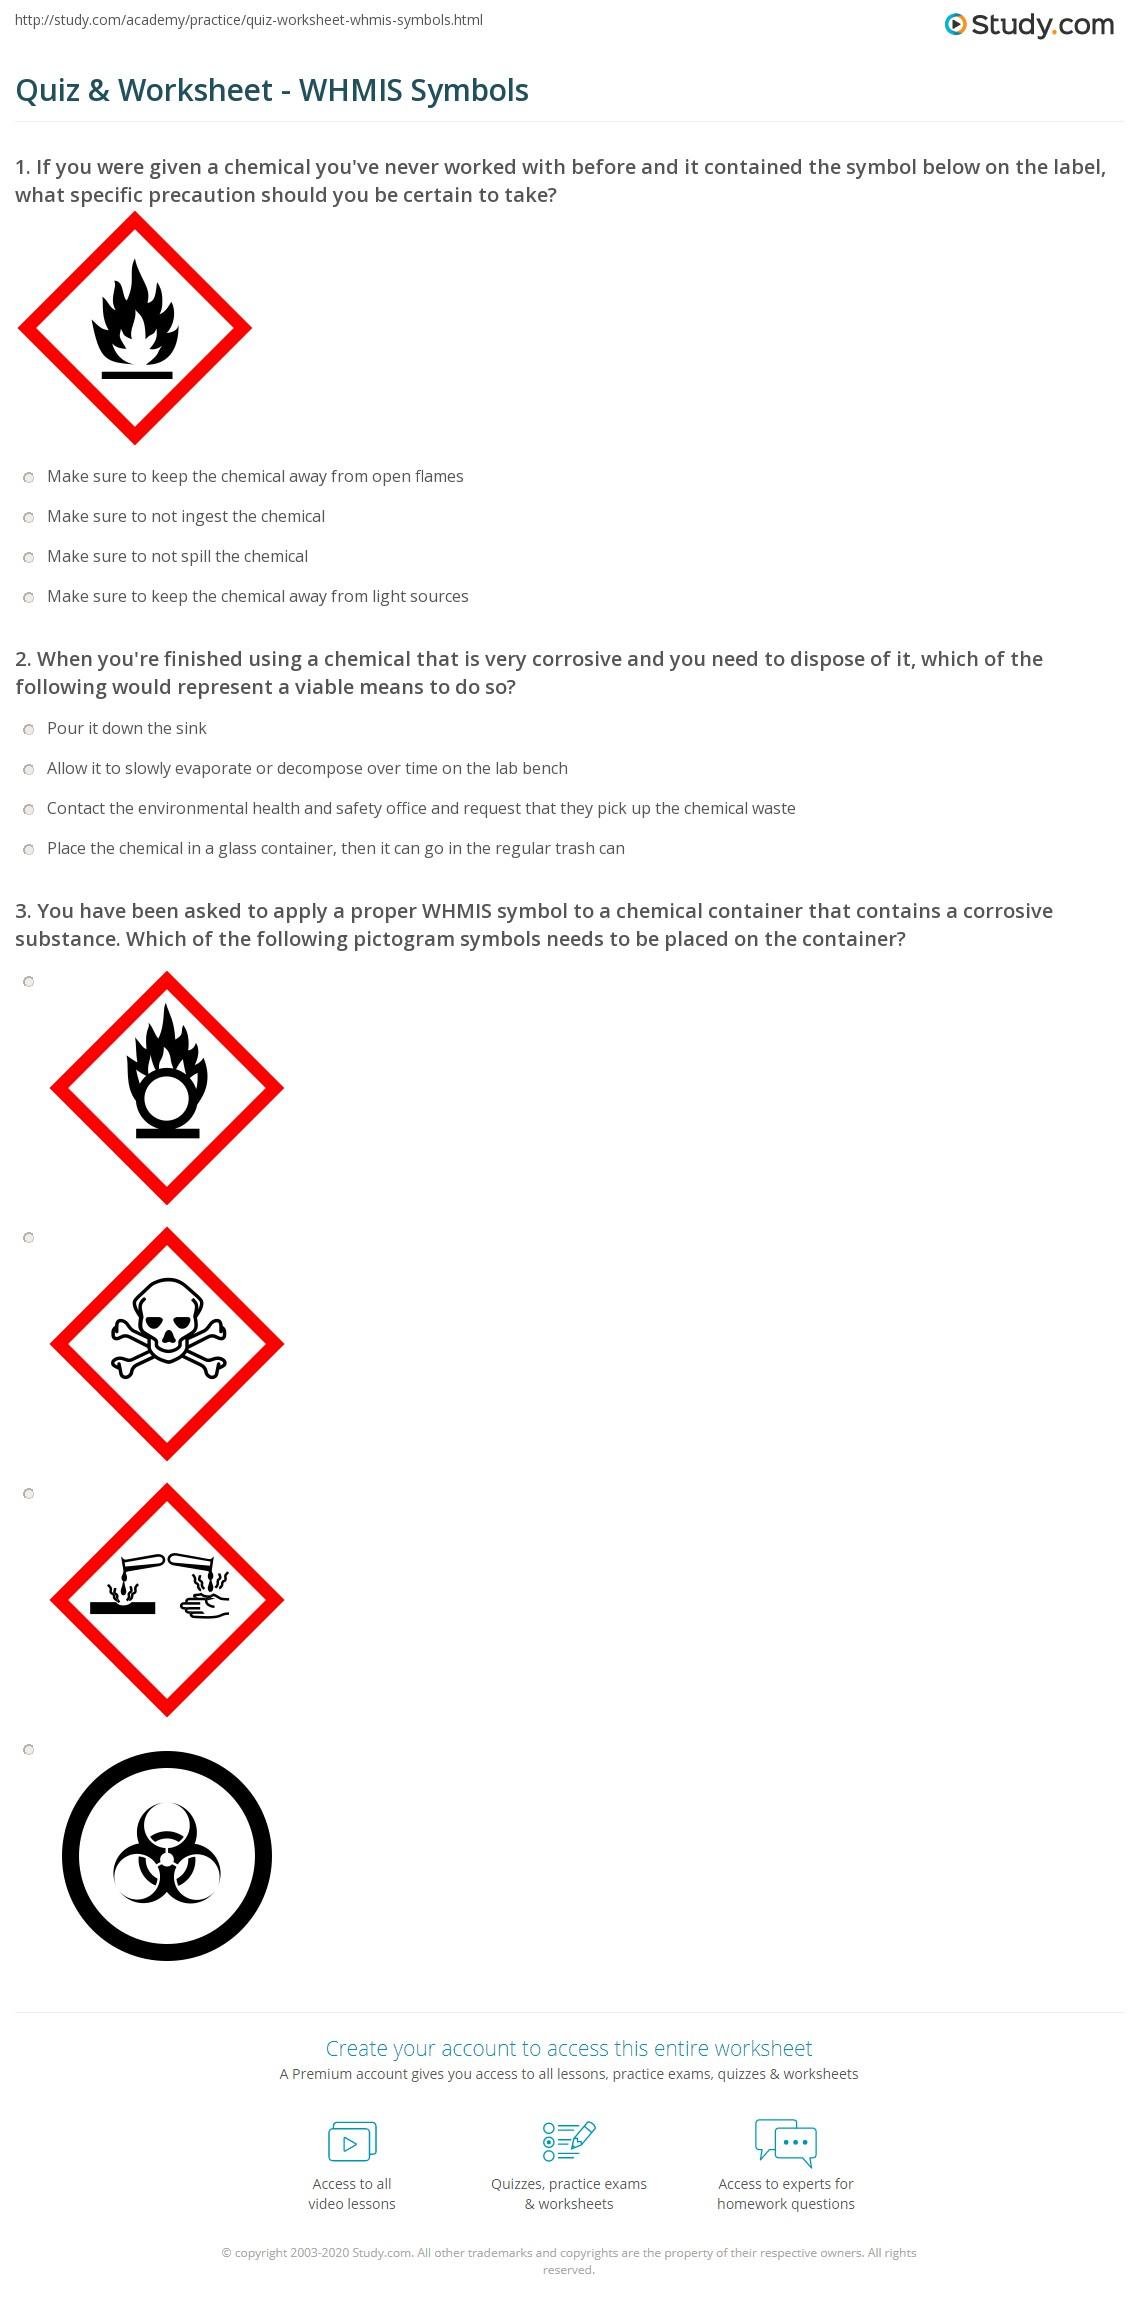 Quiz & Worksheet - WHMIS Symbols | Study com